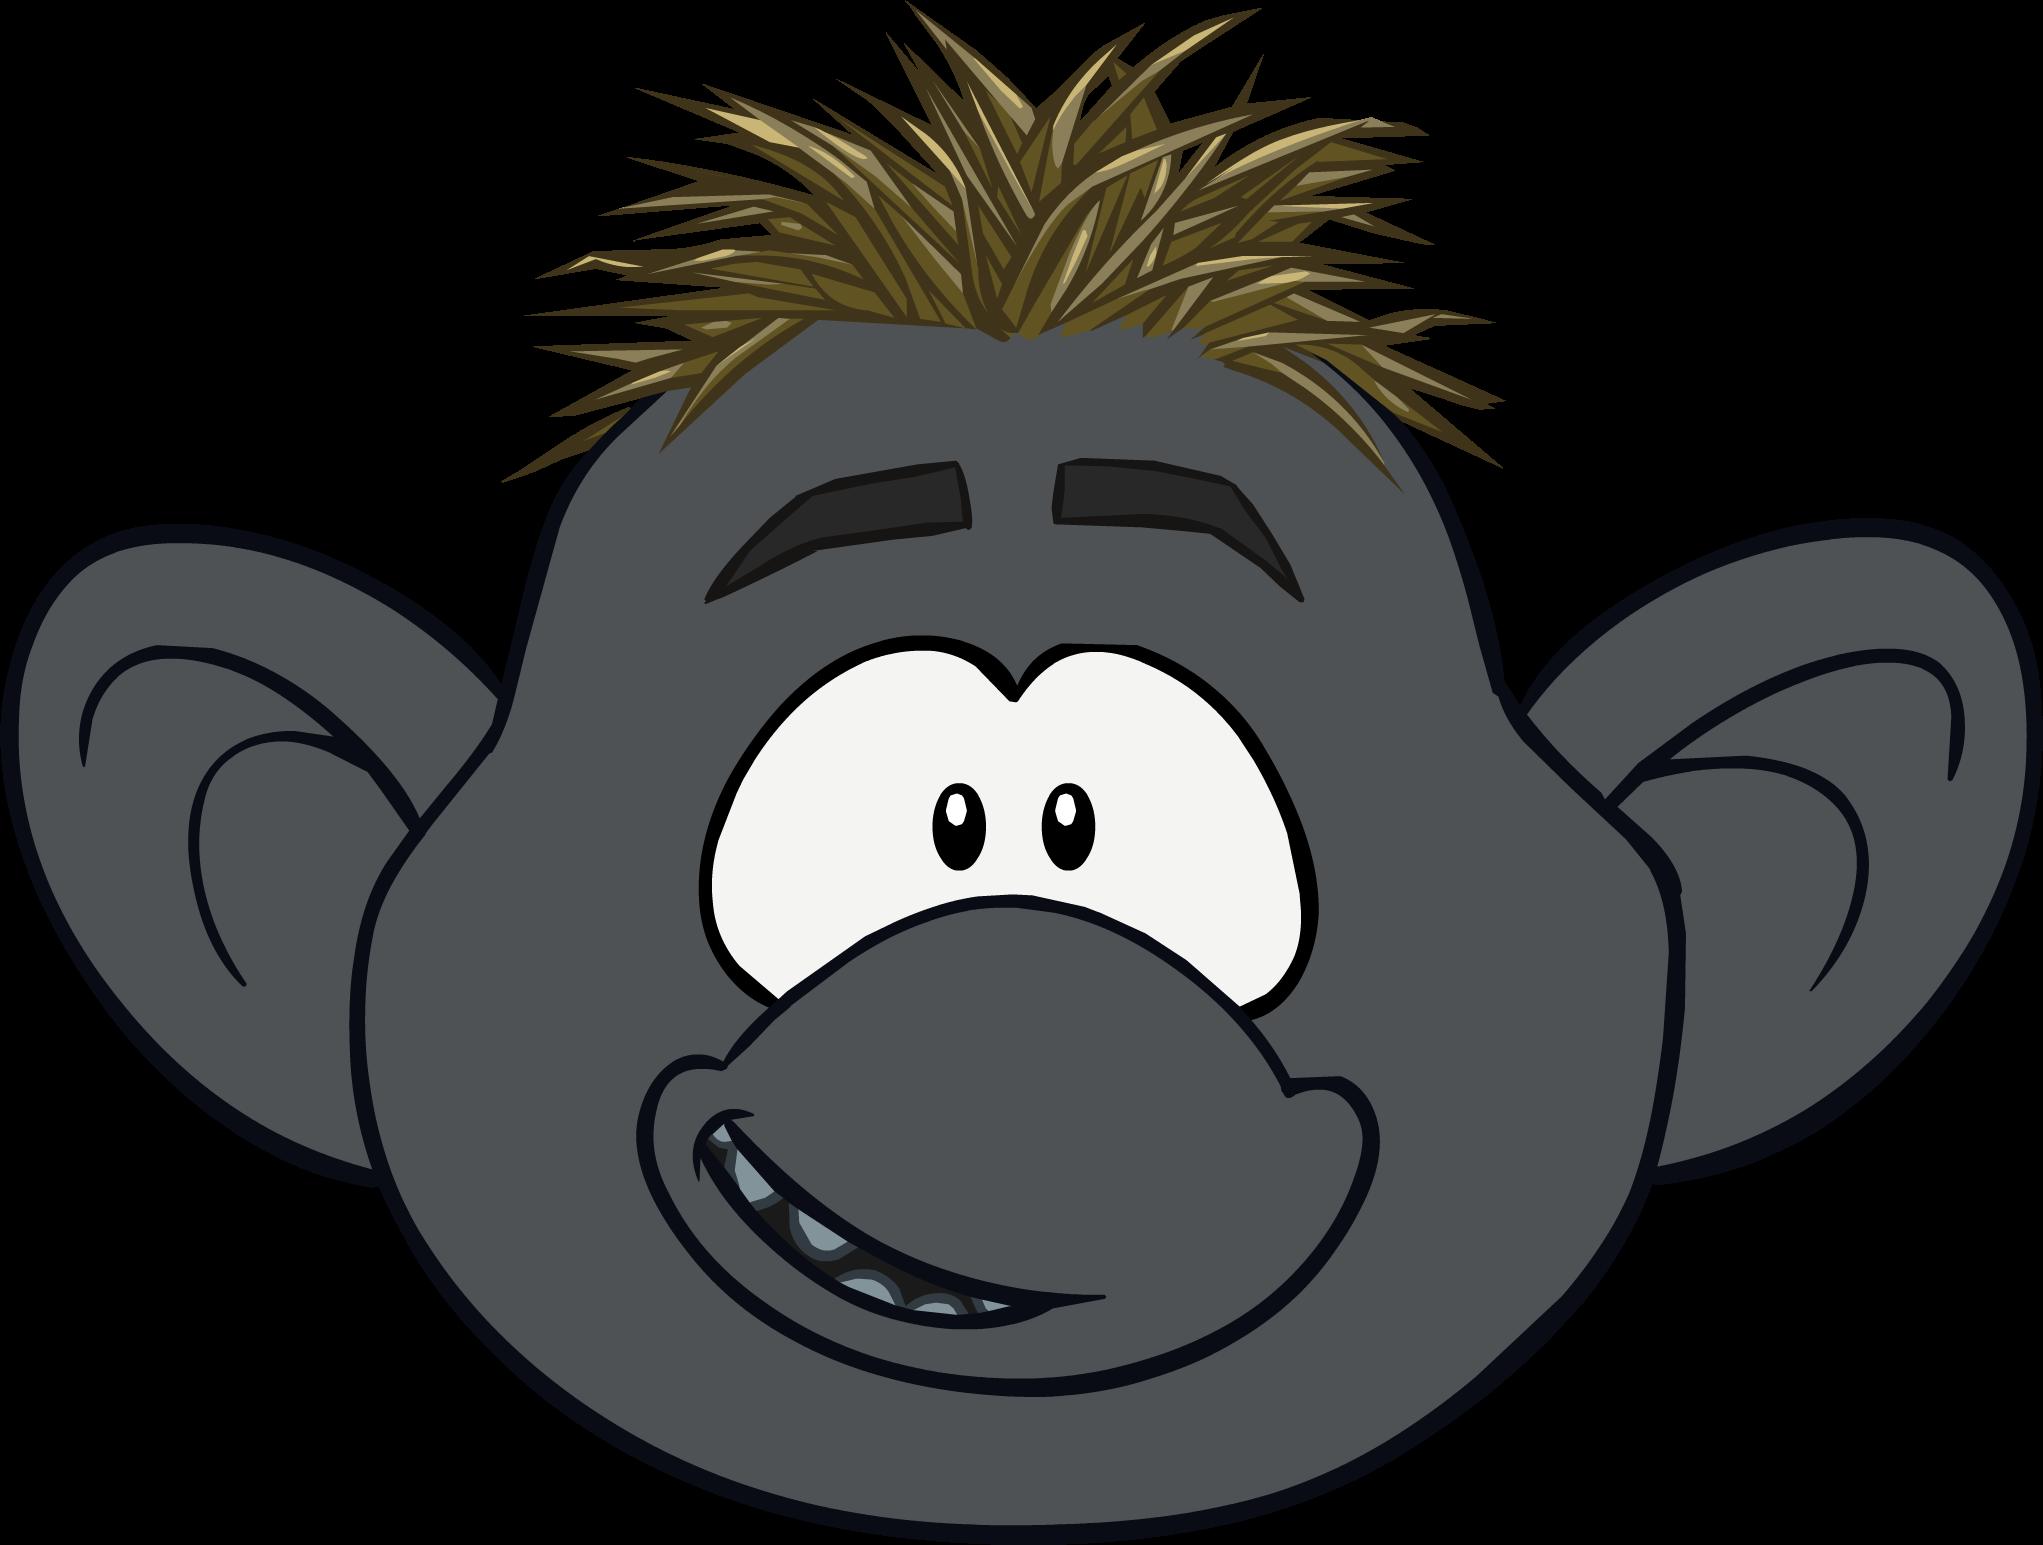 banner black and white library Troll club penguin wiki. Ape clipart gorilla mask